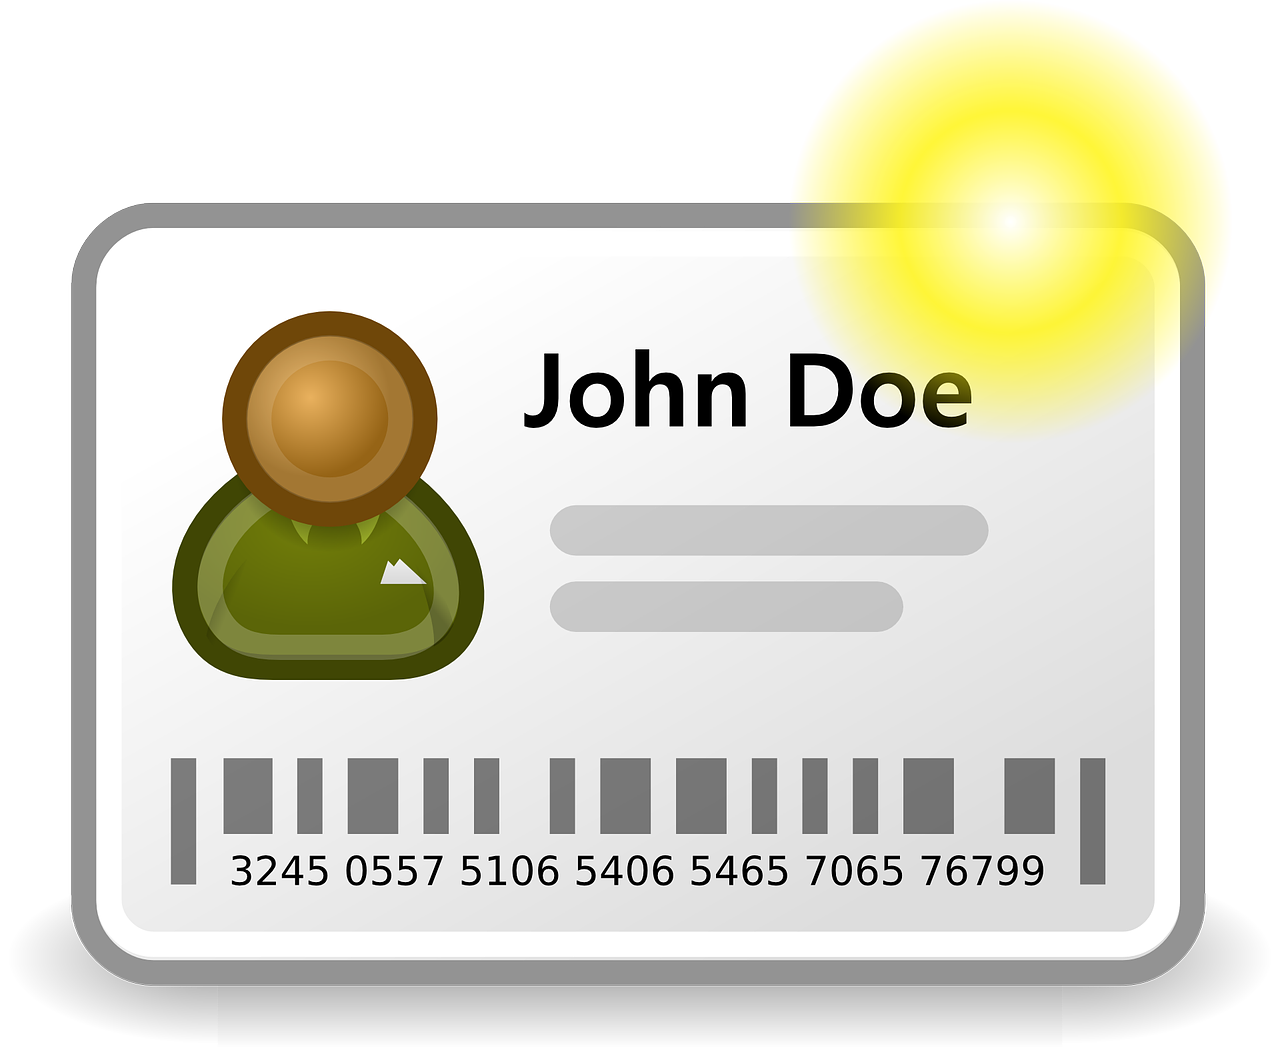 An illustration of John Doe's ID